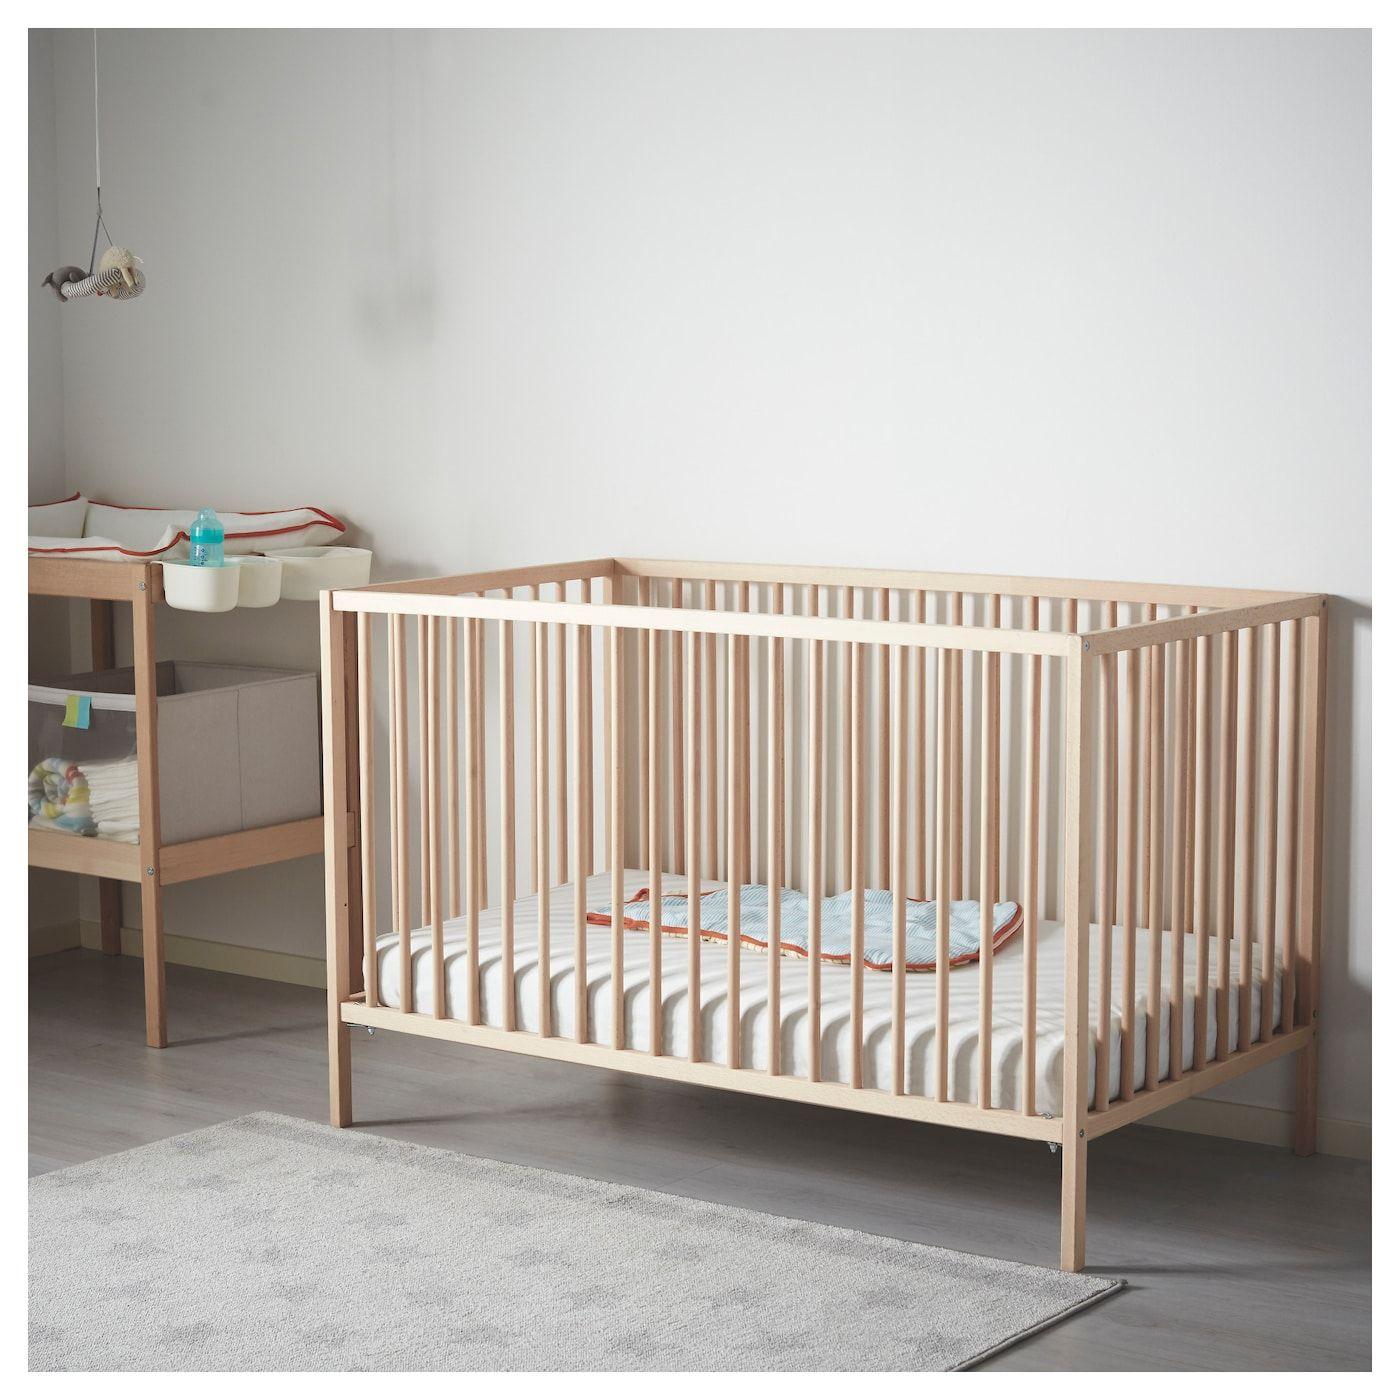 Sniglar Crib Beech 27 1 2x52 Ikea Sniglar Crib Cribs Ikea Crib